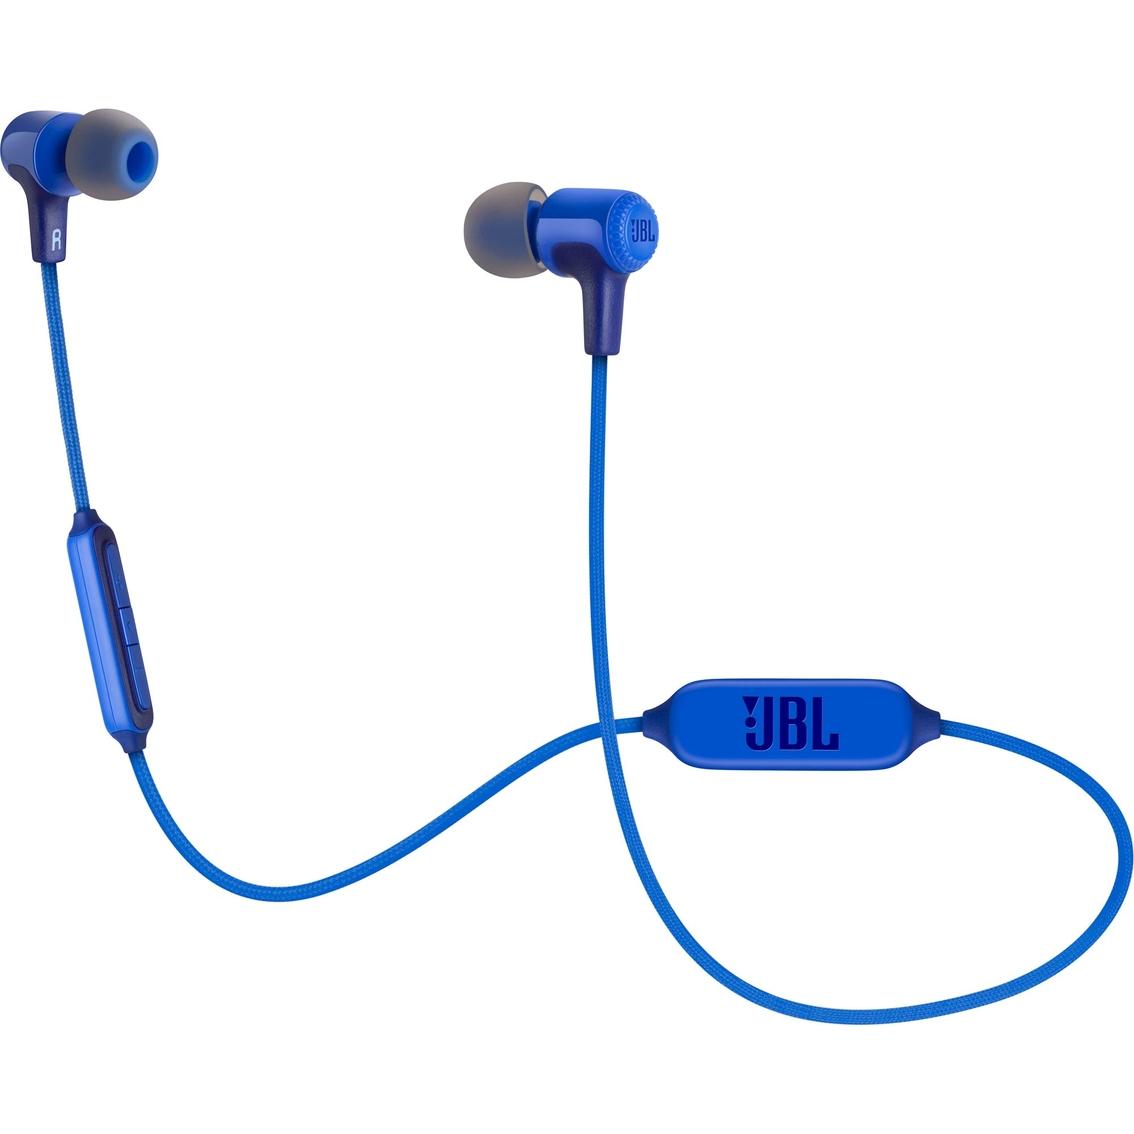 Jbl E25 In-ear Bluetooth Headphone  a5b60fd0b7